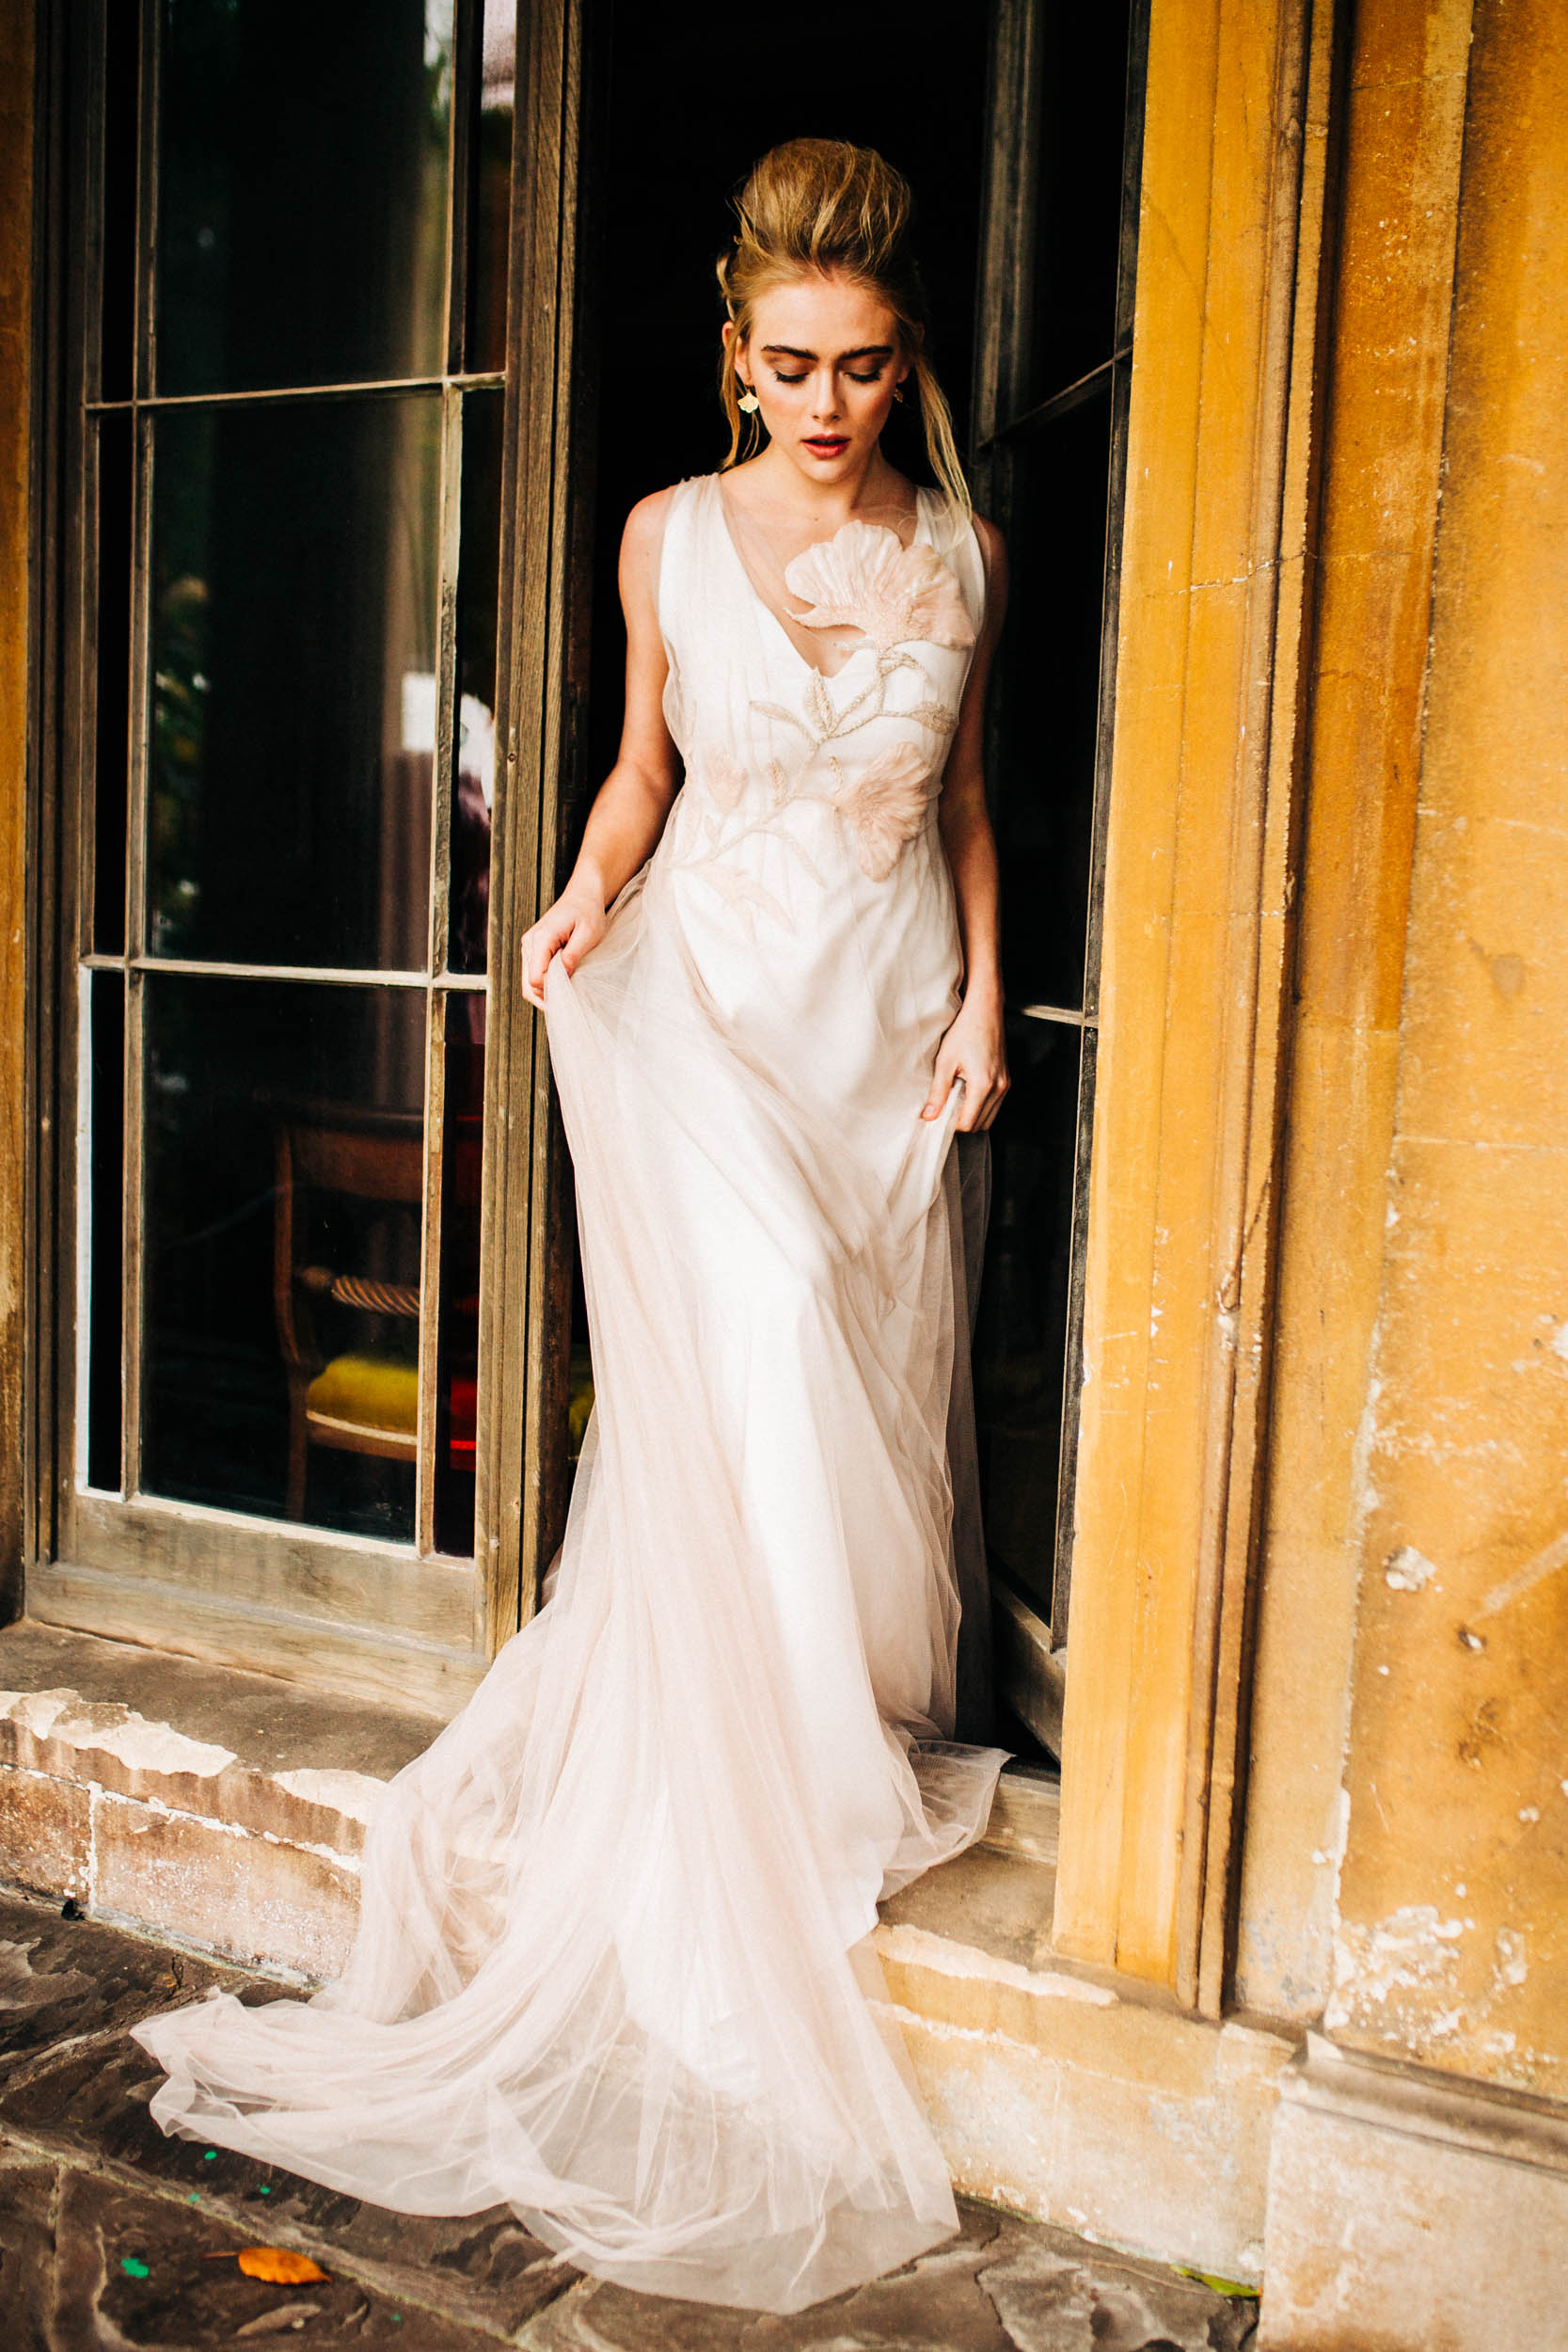 Alex_Sedgmond_Photography-SouthWalesWeddingPhotography-Wedding-Photographer-Cardiff-249.jpg